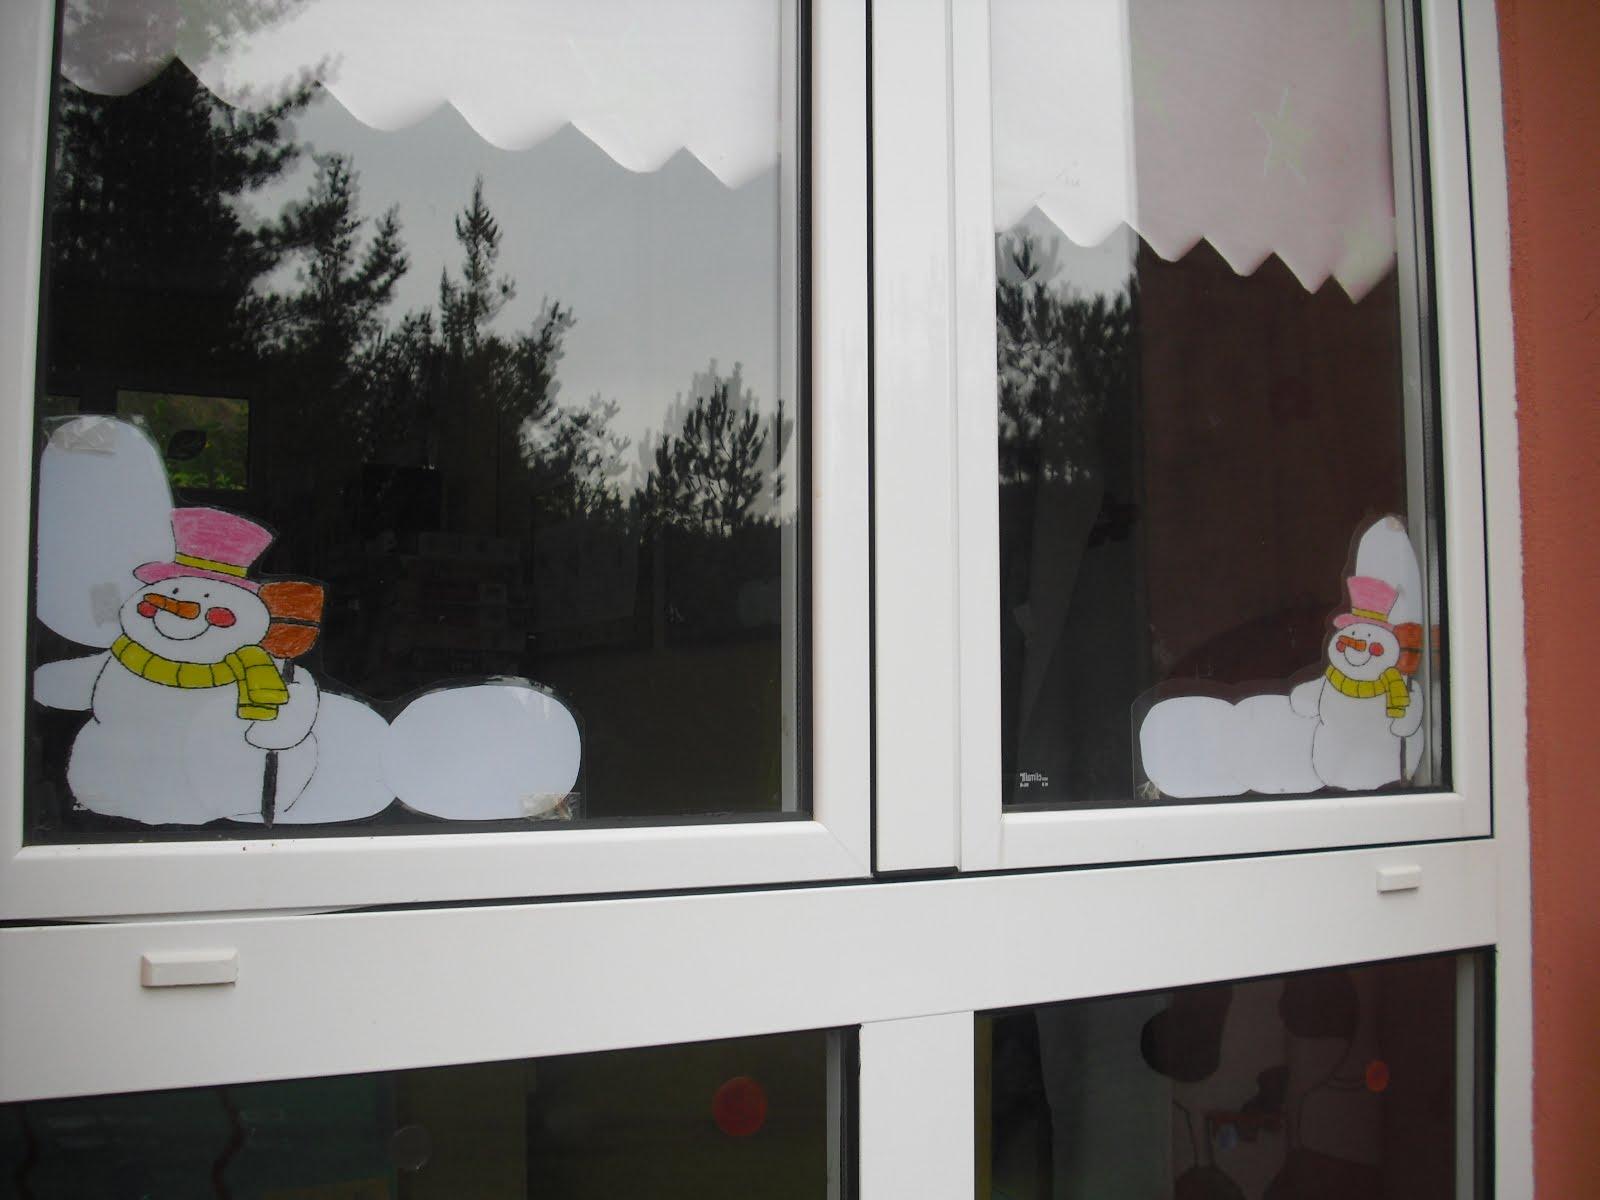 Cole de colores esquineras invernales para ventanas for Esquineras de pared